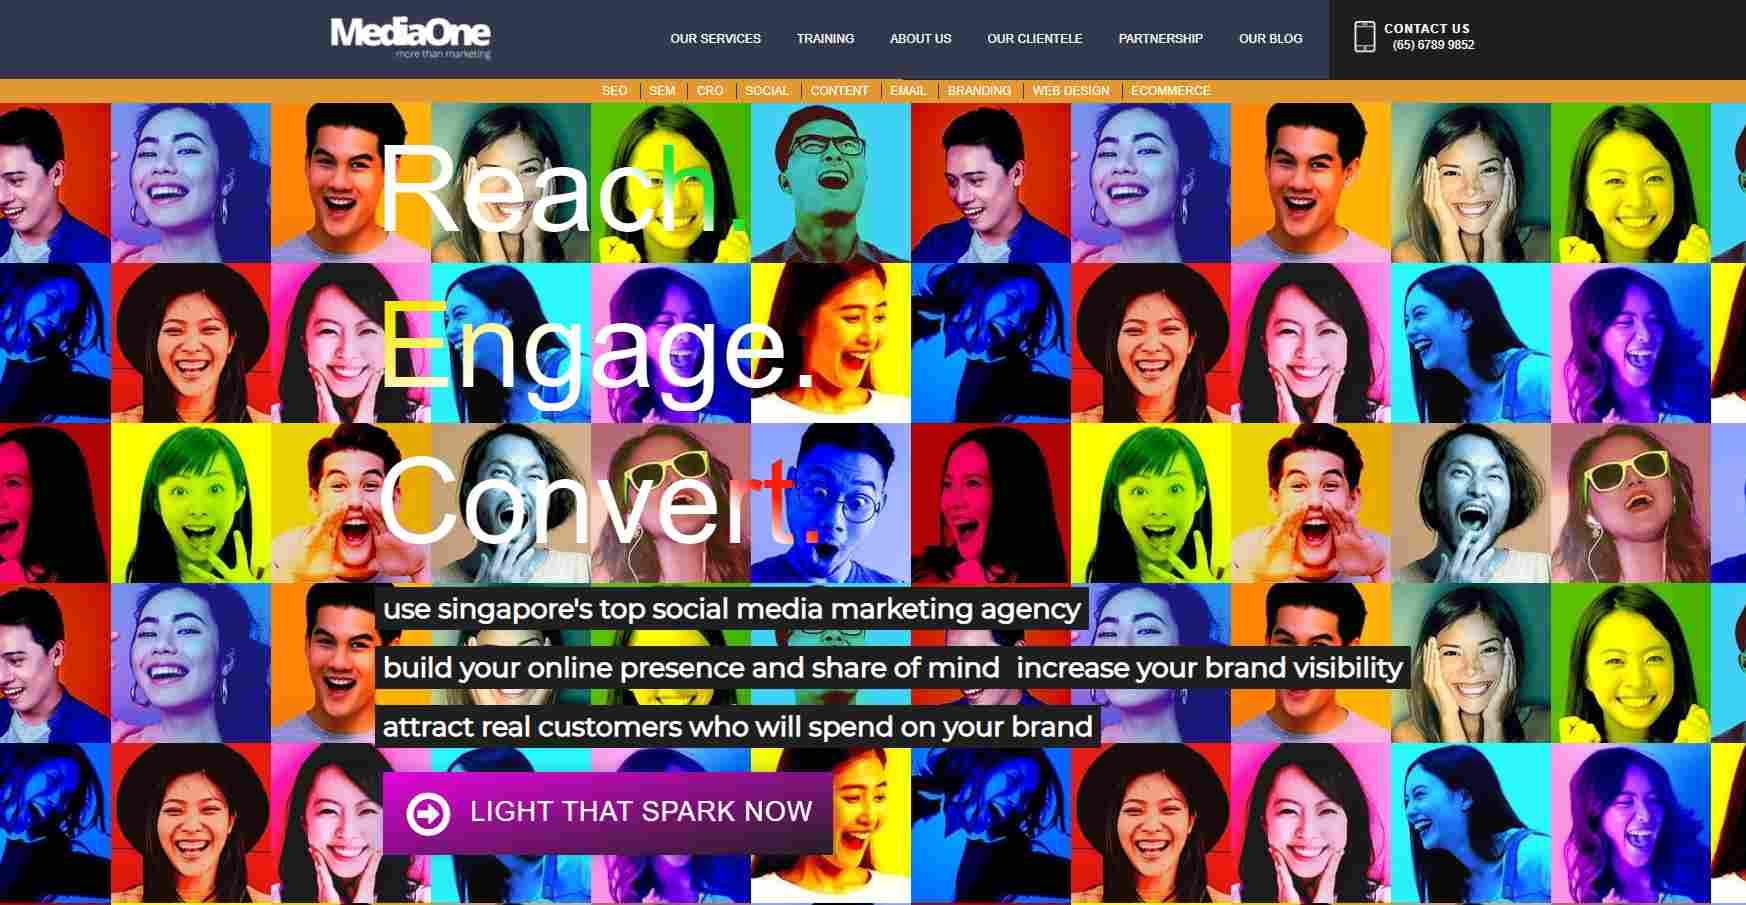 mediaone 15 Top Facebook Marketing Agencies in Singapore